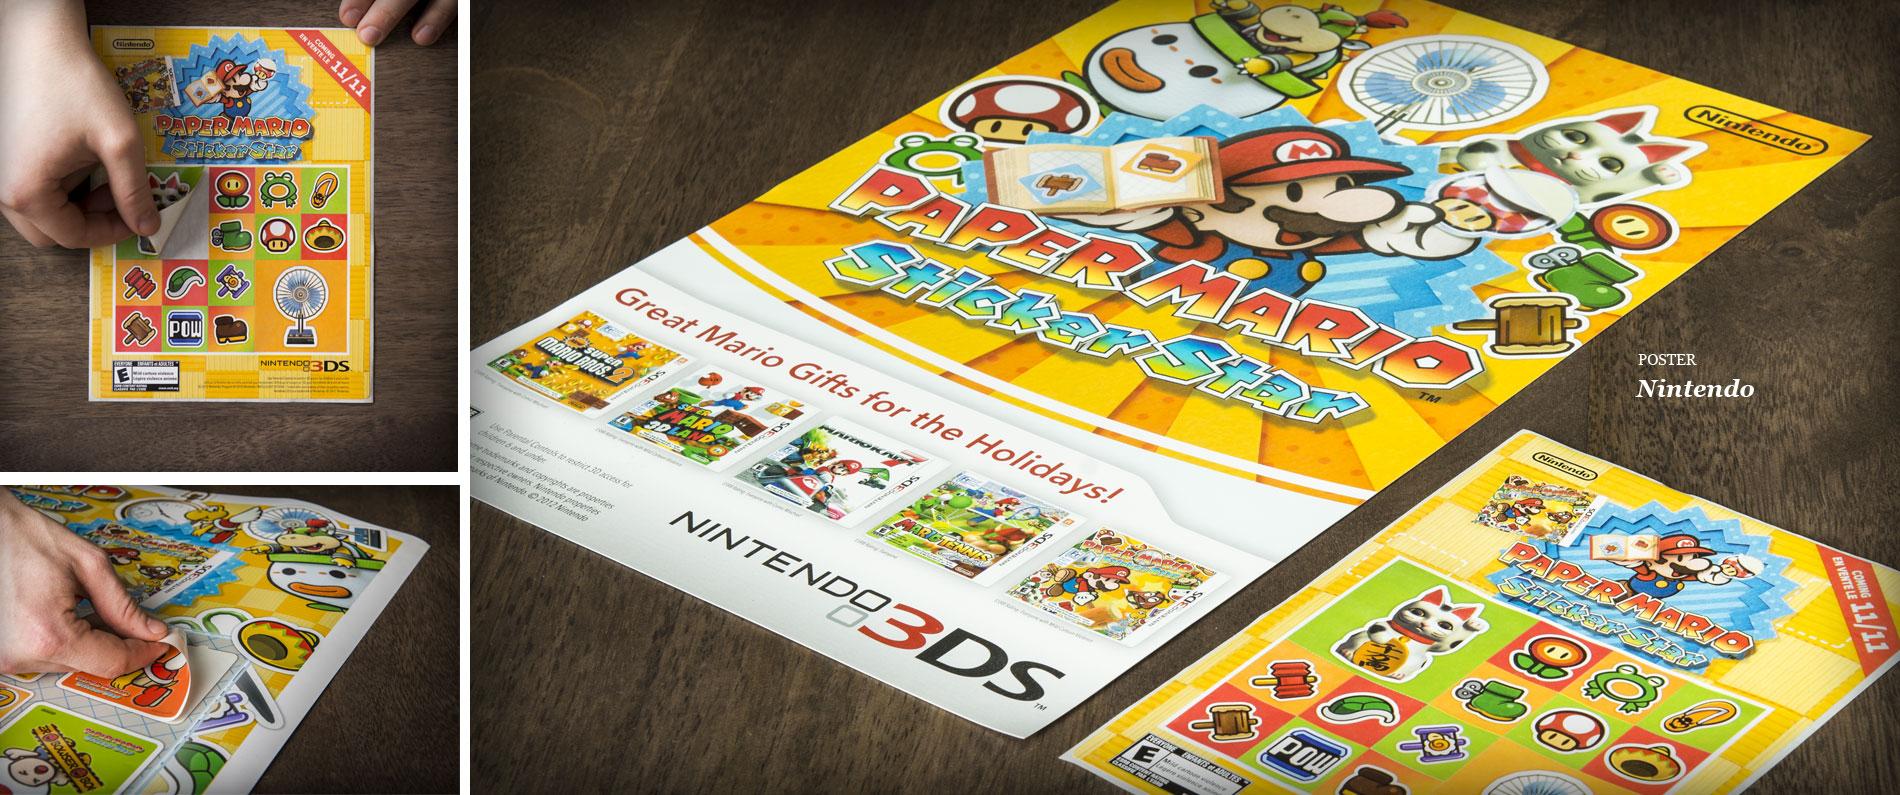 Nintendo sticker poster